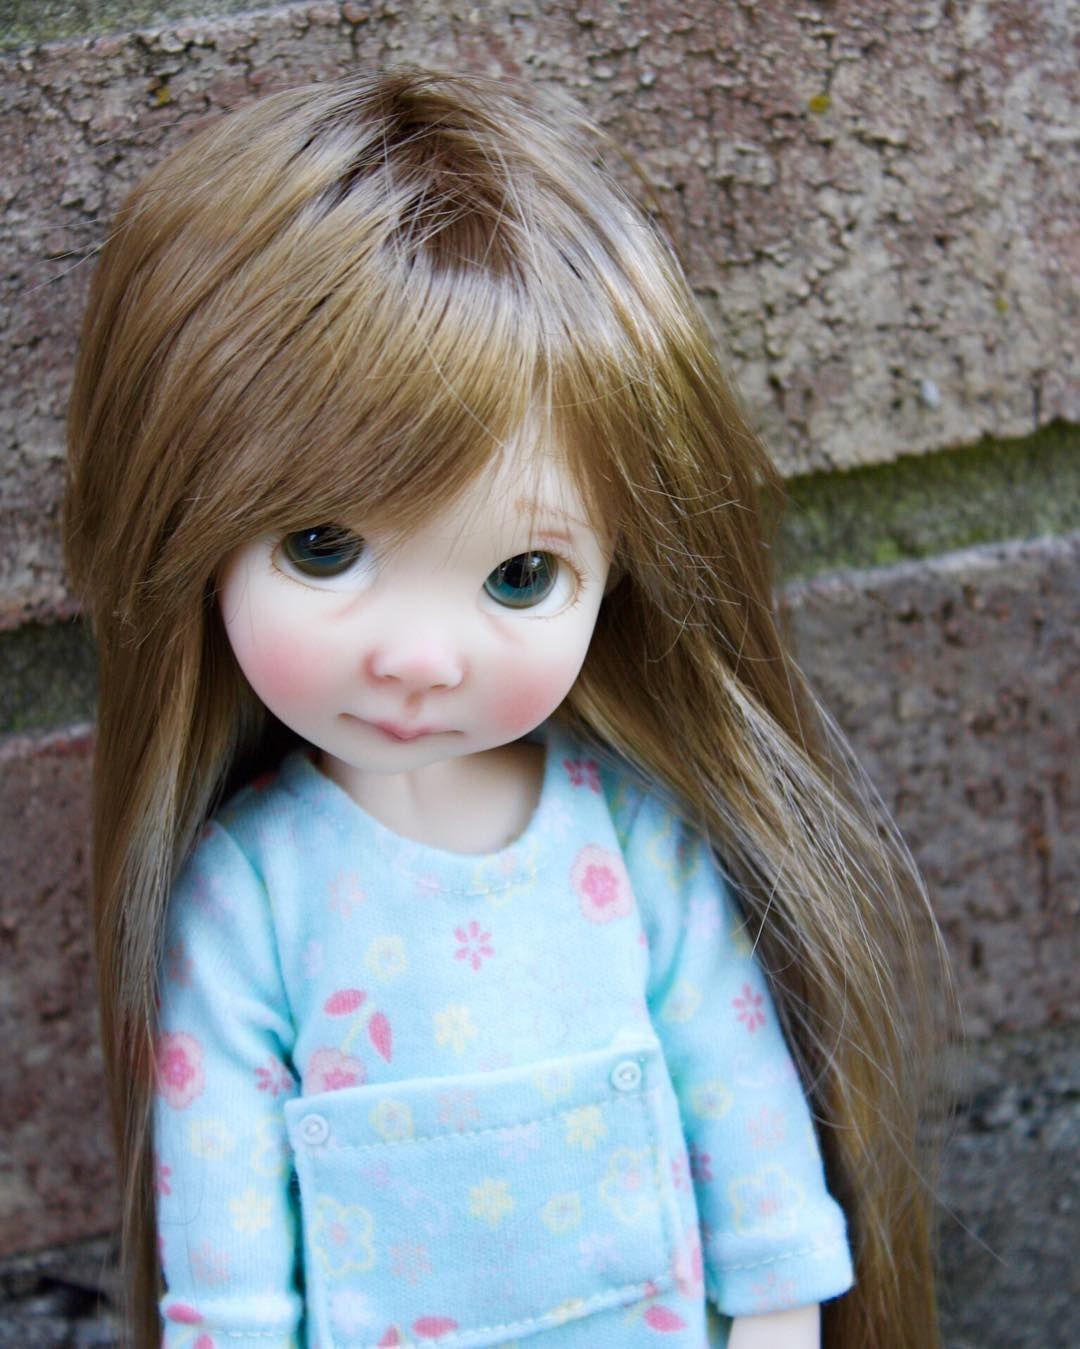 Adeline...#artdoll #handmade #artist #bjd #nikkibritt #nikkibrittstudios #artcollector #artcollective #resin #doll #dolls #arttoy #dollstagram